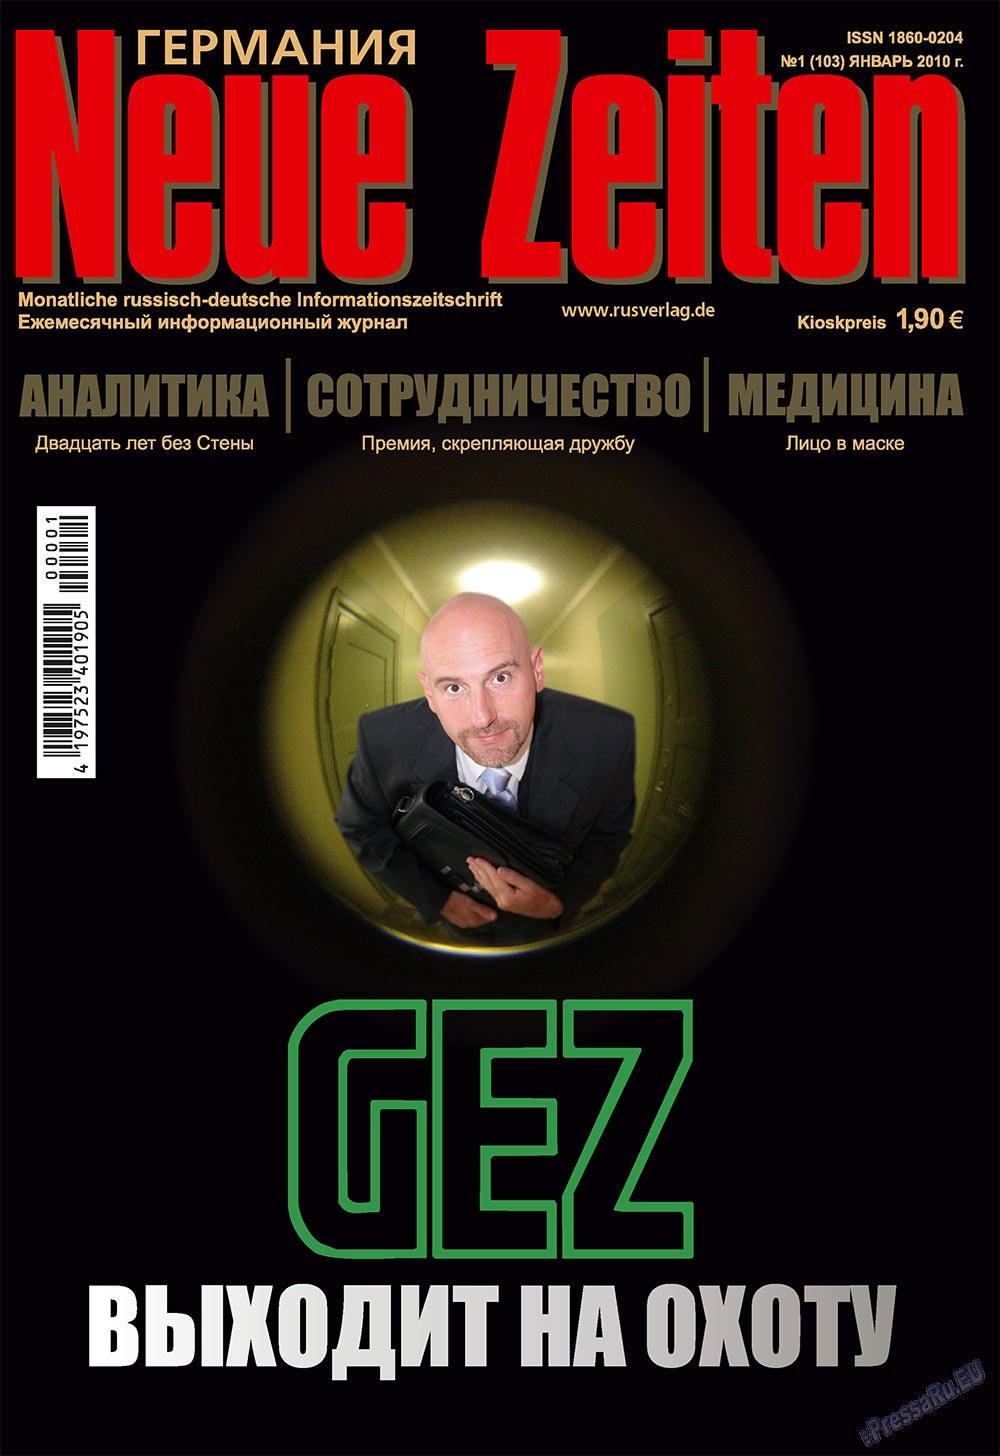 Neue Zeiten (журнал). 2010 год, номер 1, стр. 1